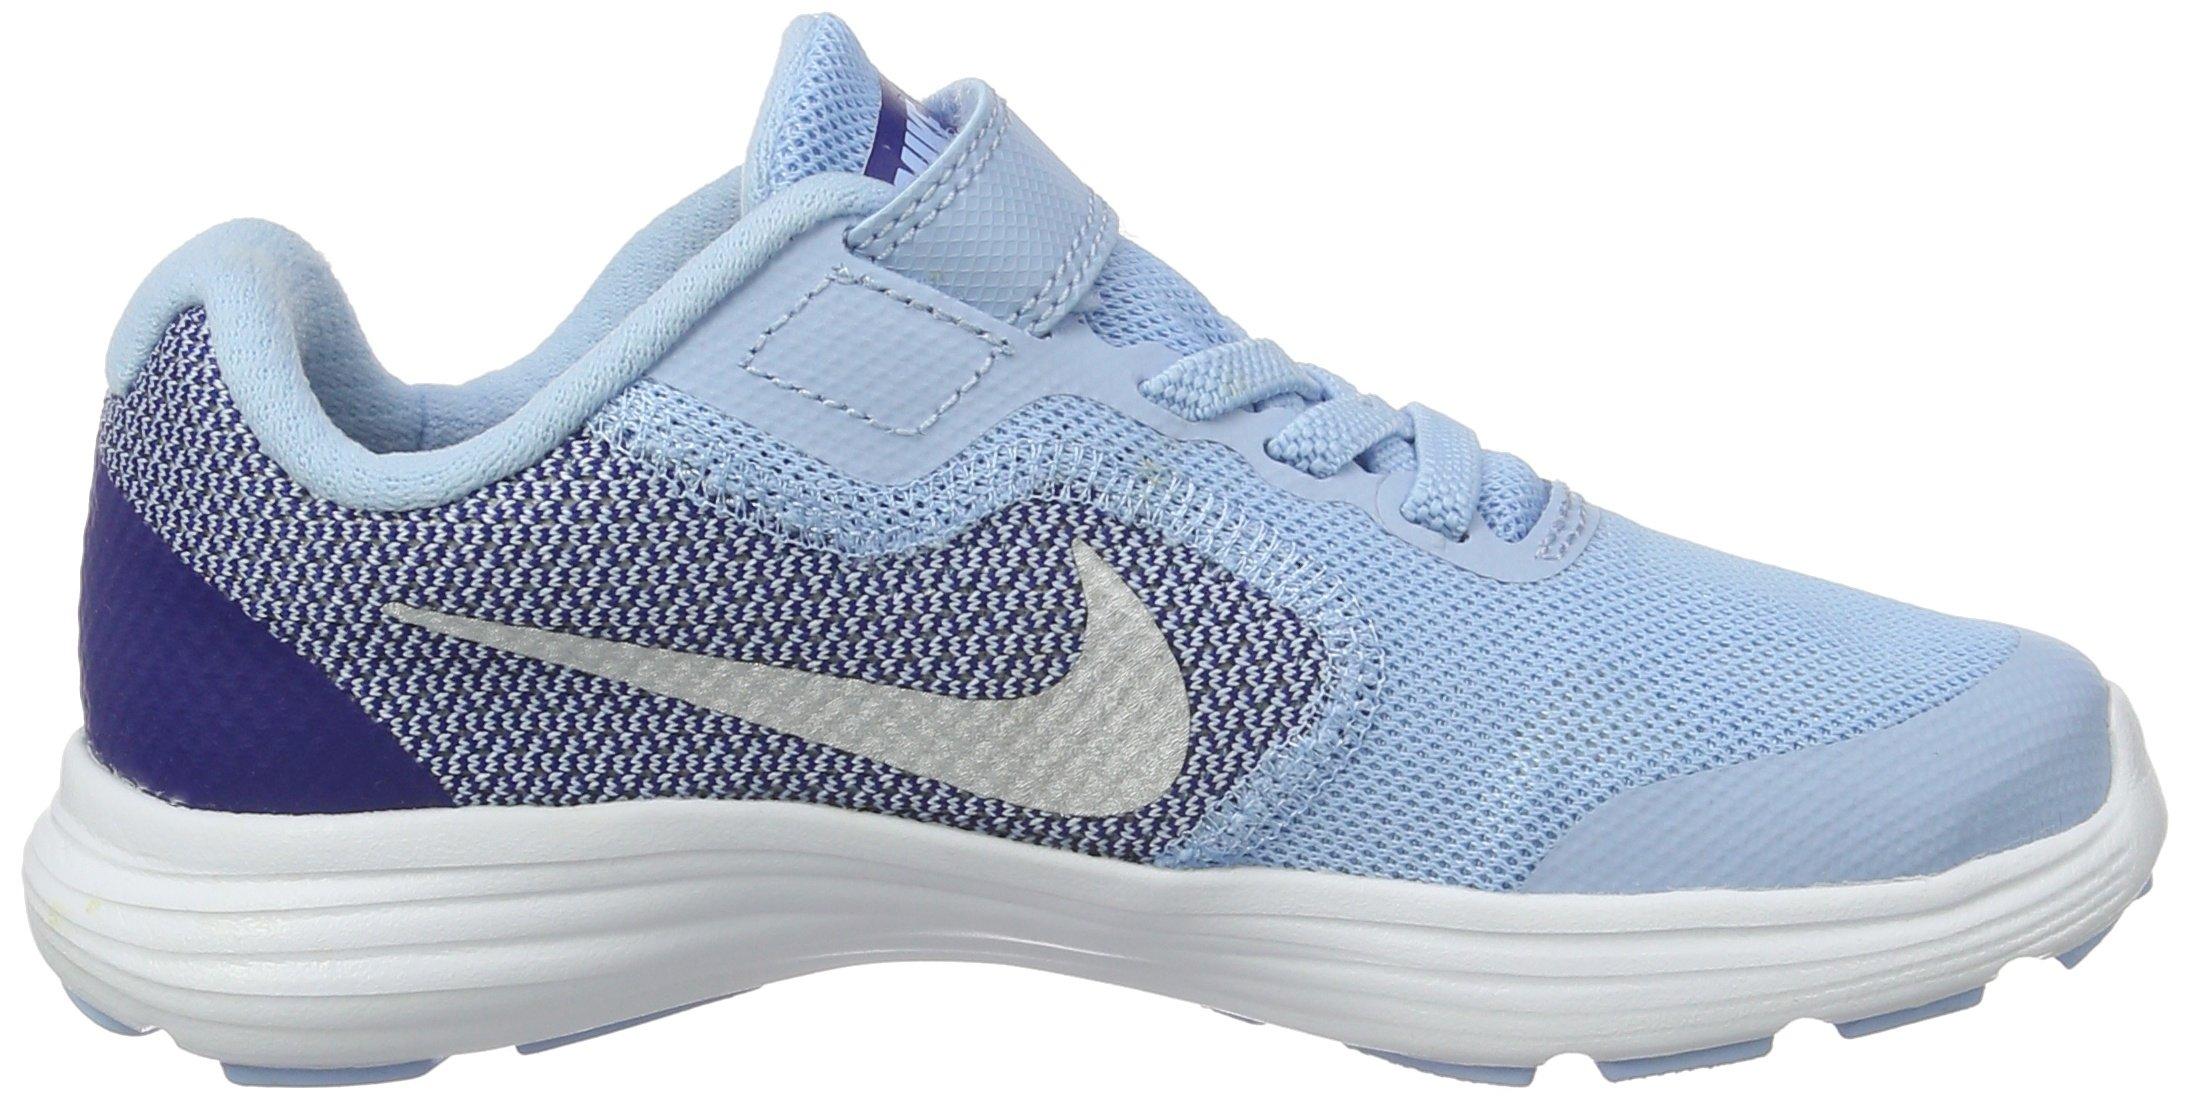 NIKE Kids' Revolution 3 (Psv) Running-Shoes, Bluecap/Metallic Silver/Deep Royal Blue, 1 M US Little Kid by Nike (Image #6)